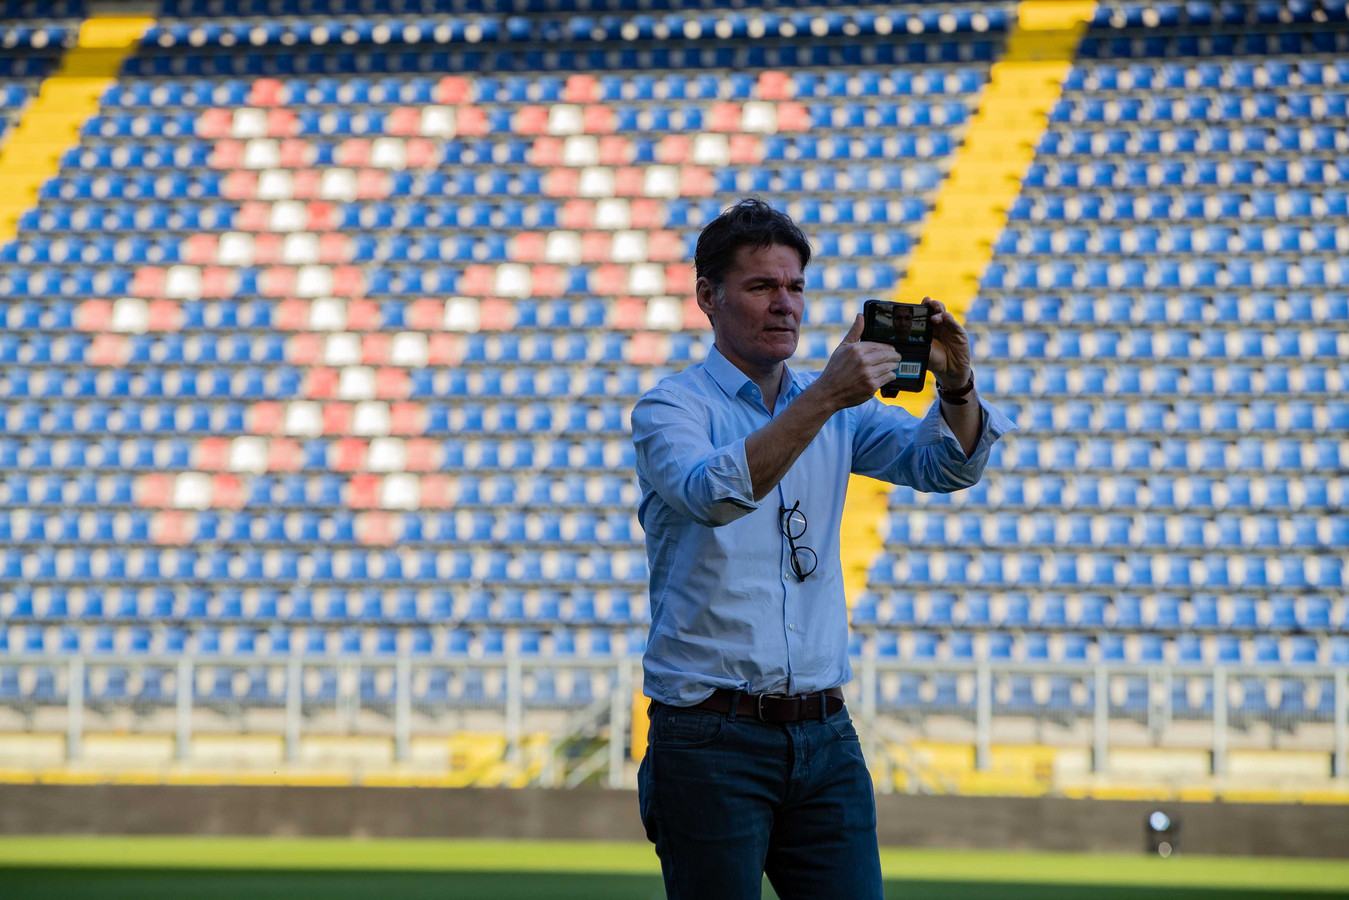 Burgemeester Paul Depla van Breda in het stadion van NAC.